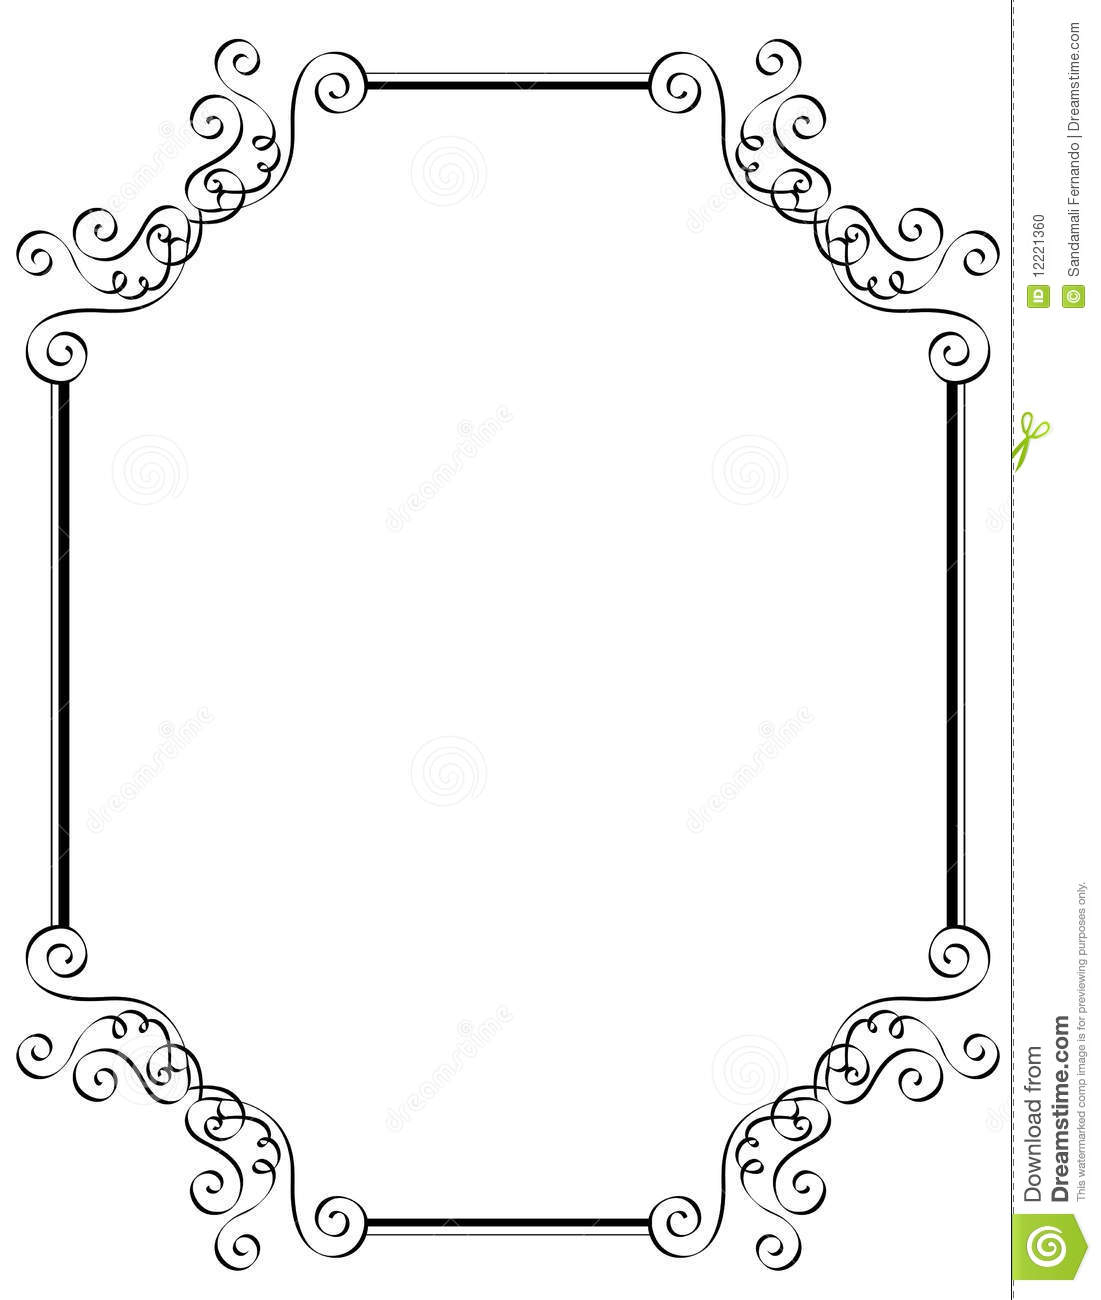 Printable Wedding Borders Clipart - Free Printable Wedding Clipart Borders